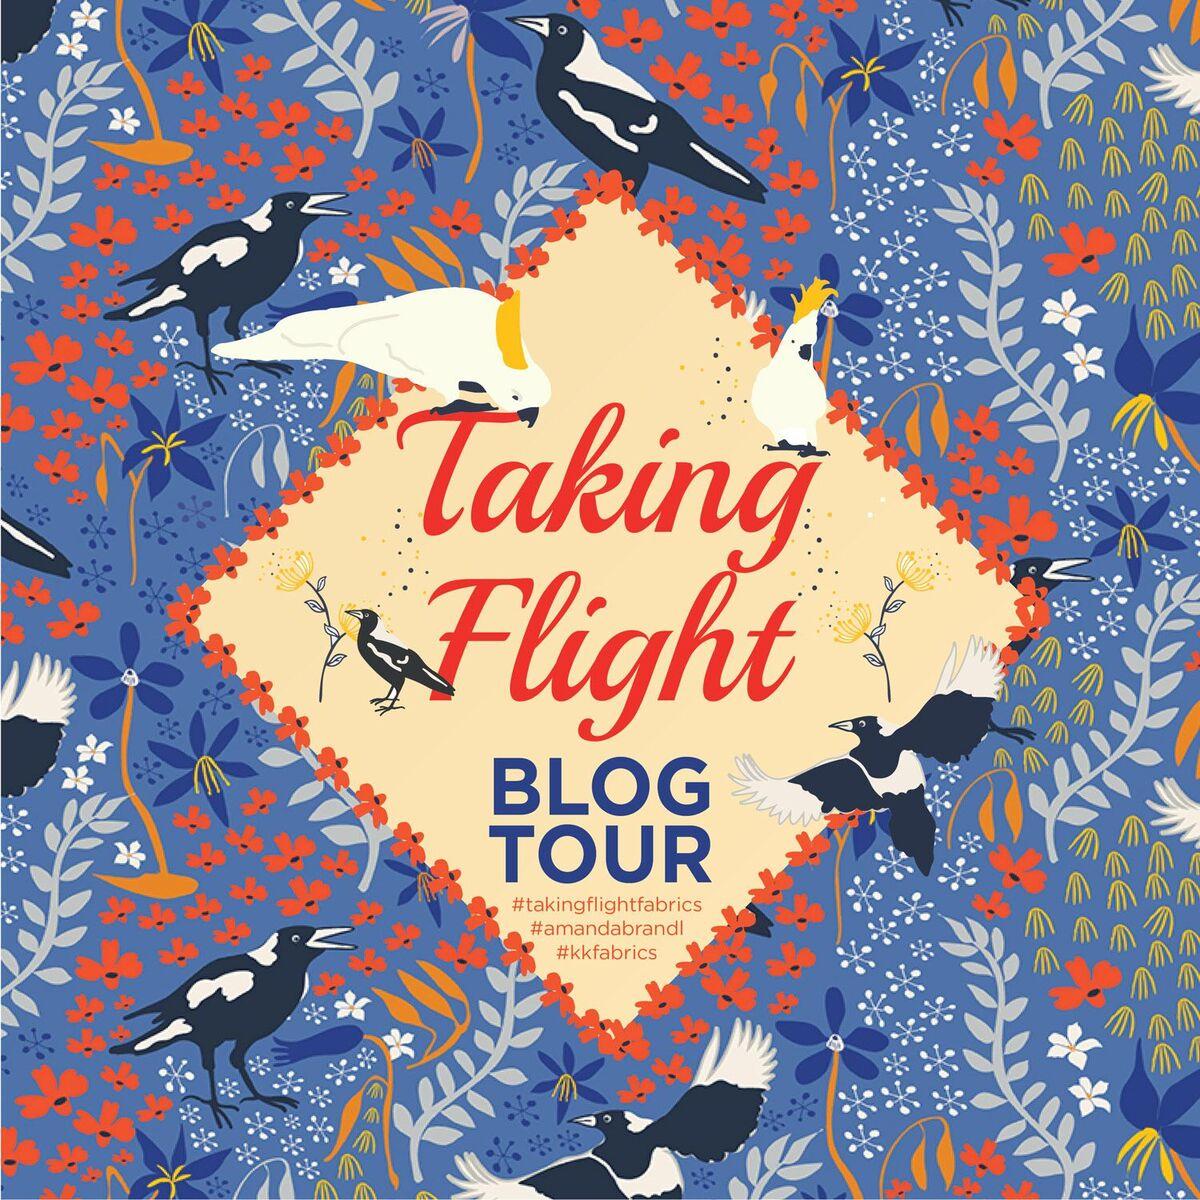 Taking-Flight-blog-tour_preview.jpg